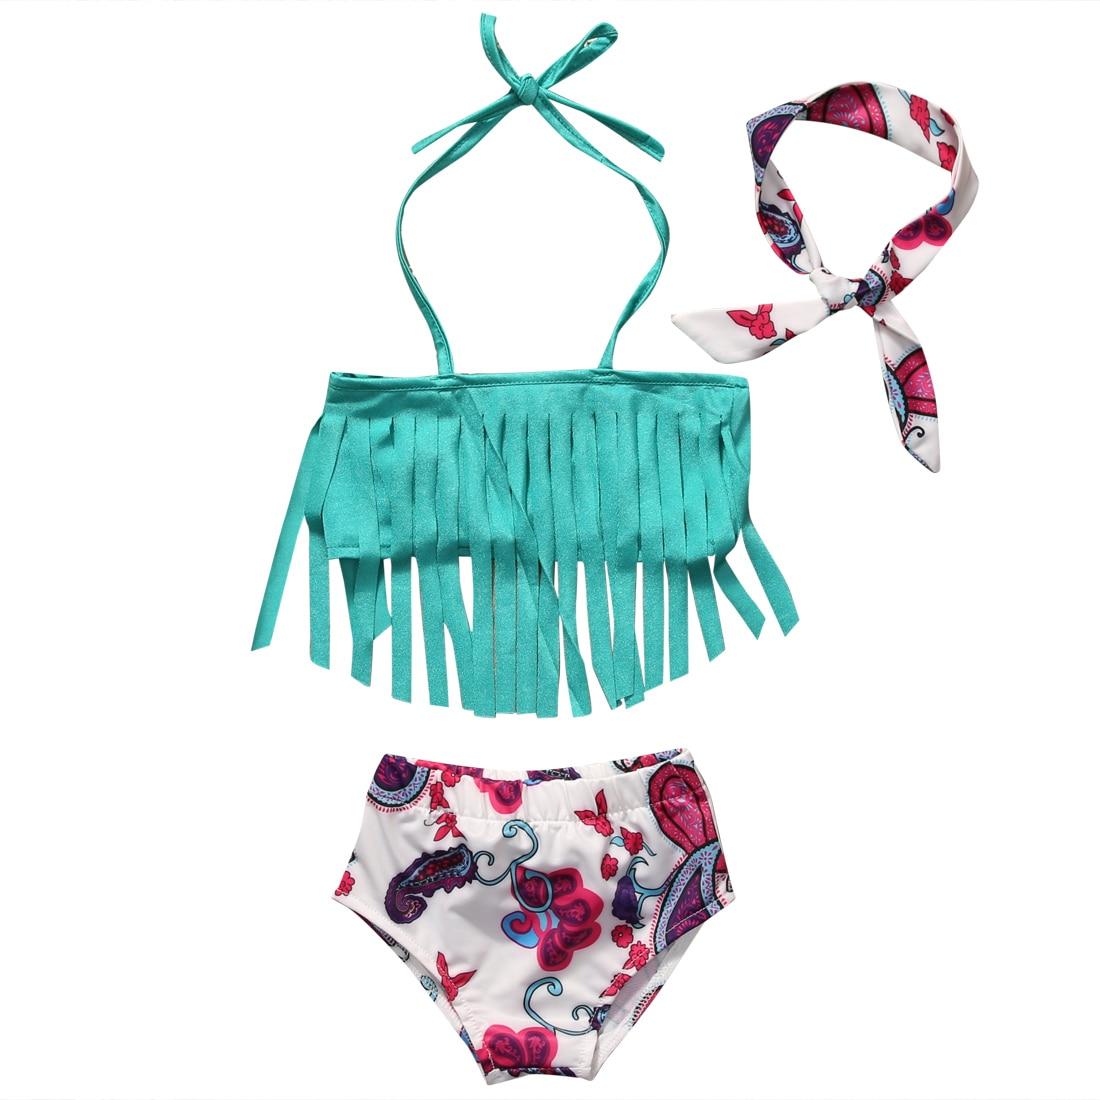 ad2f899601e5 Girls 3 pcs Tankini Bikini Set Bathing Suit Triangle Beachwear Kawaii Kids  Swimwear